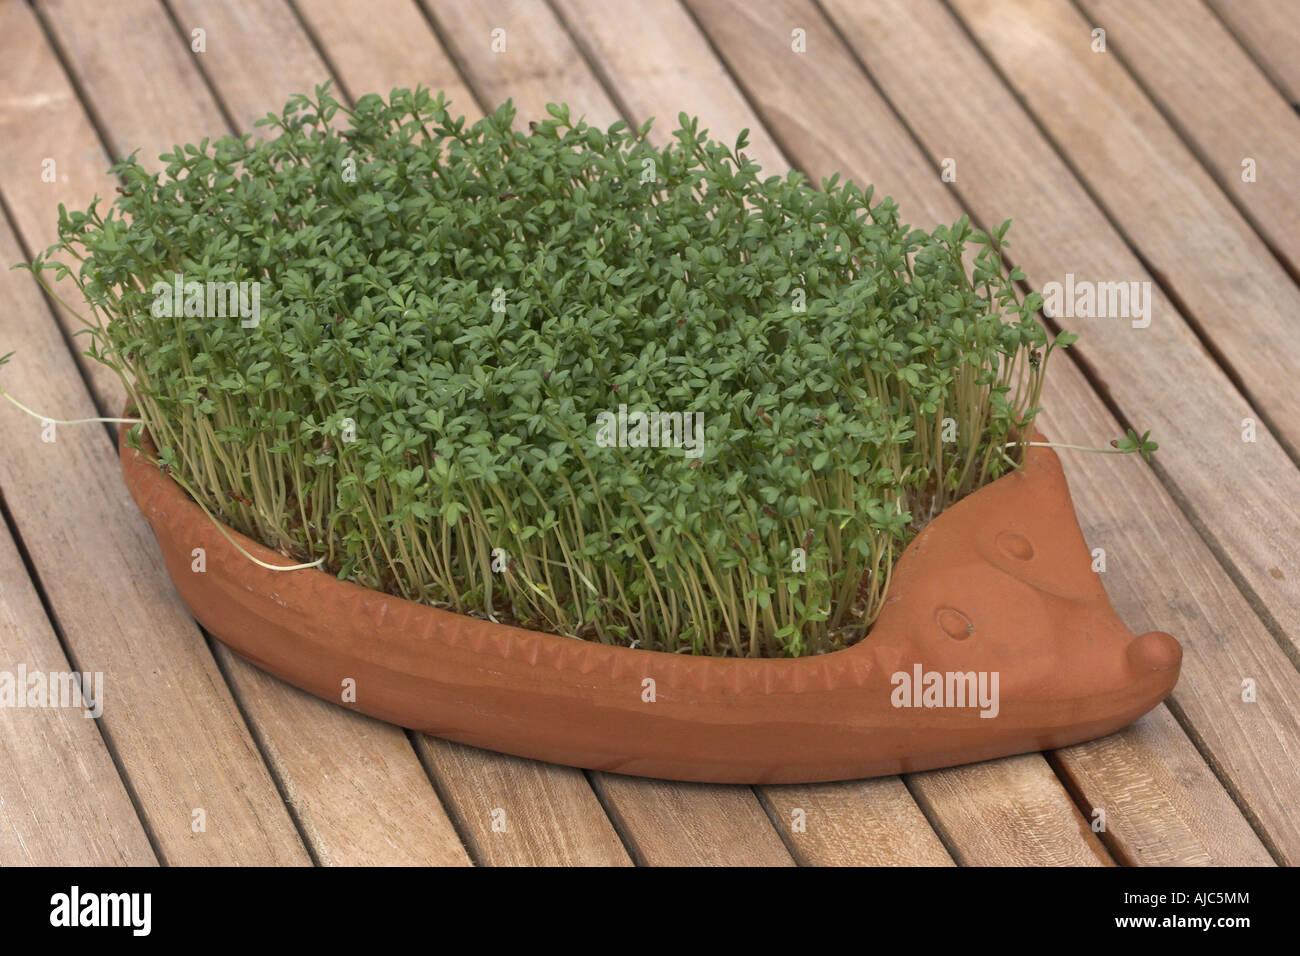 garden cress (Lepidium sativum), seedlings in hedgehog of clay - Stock Image